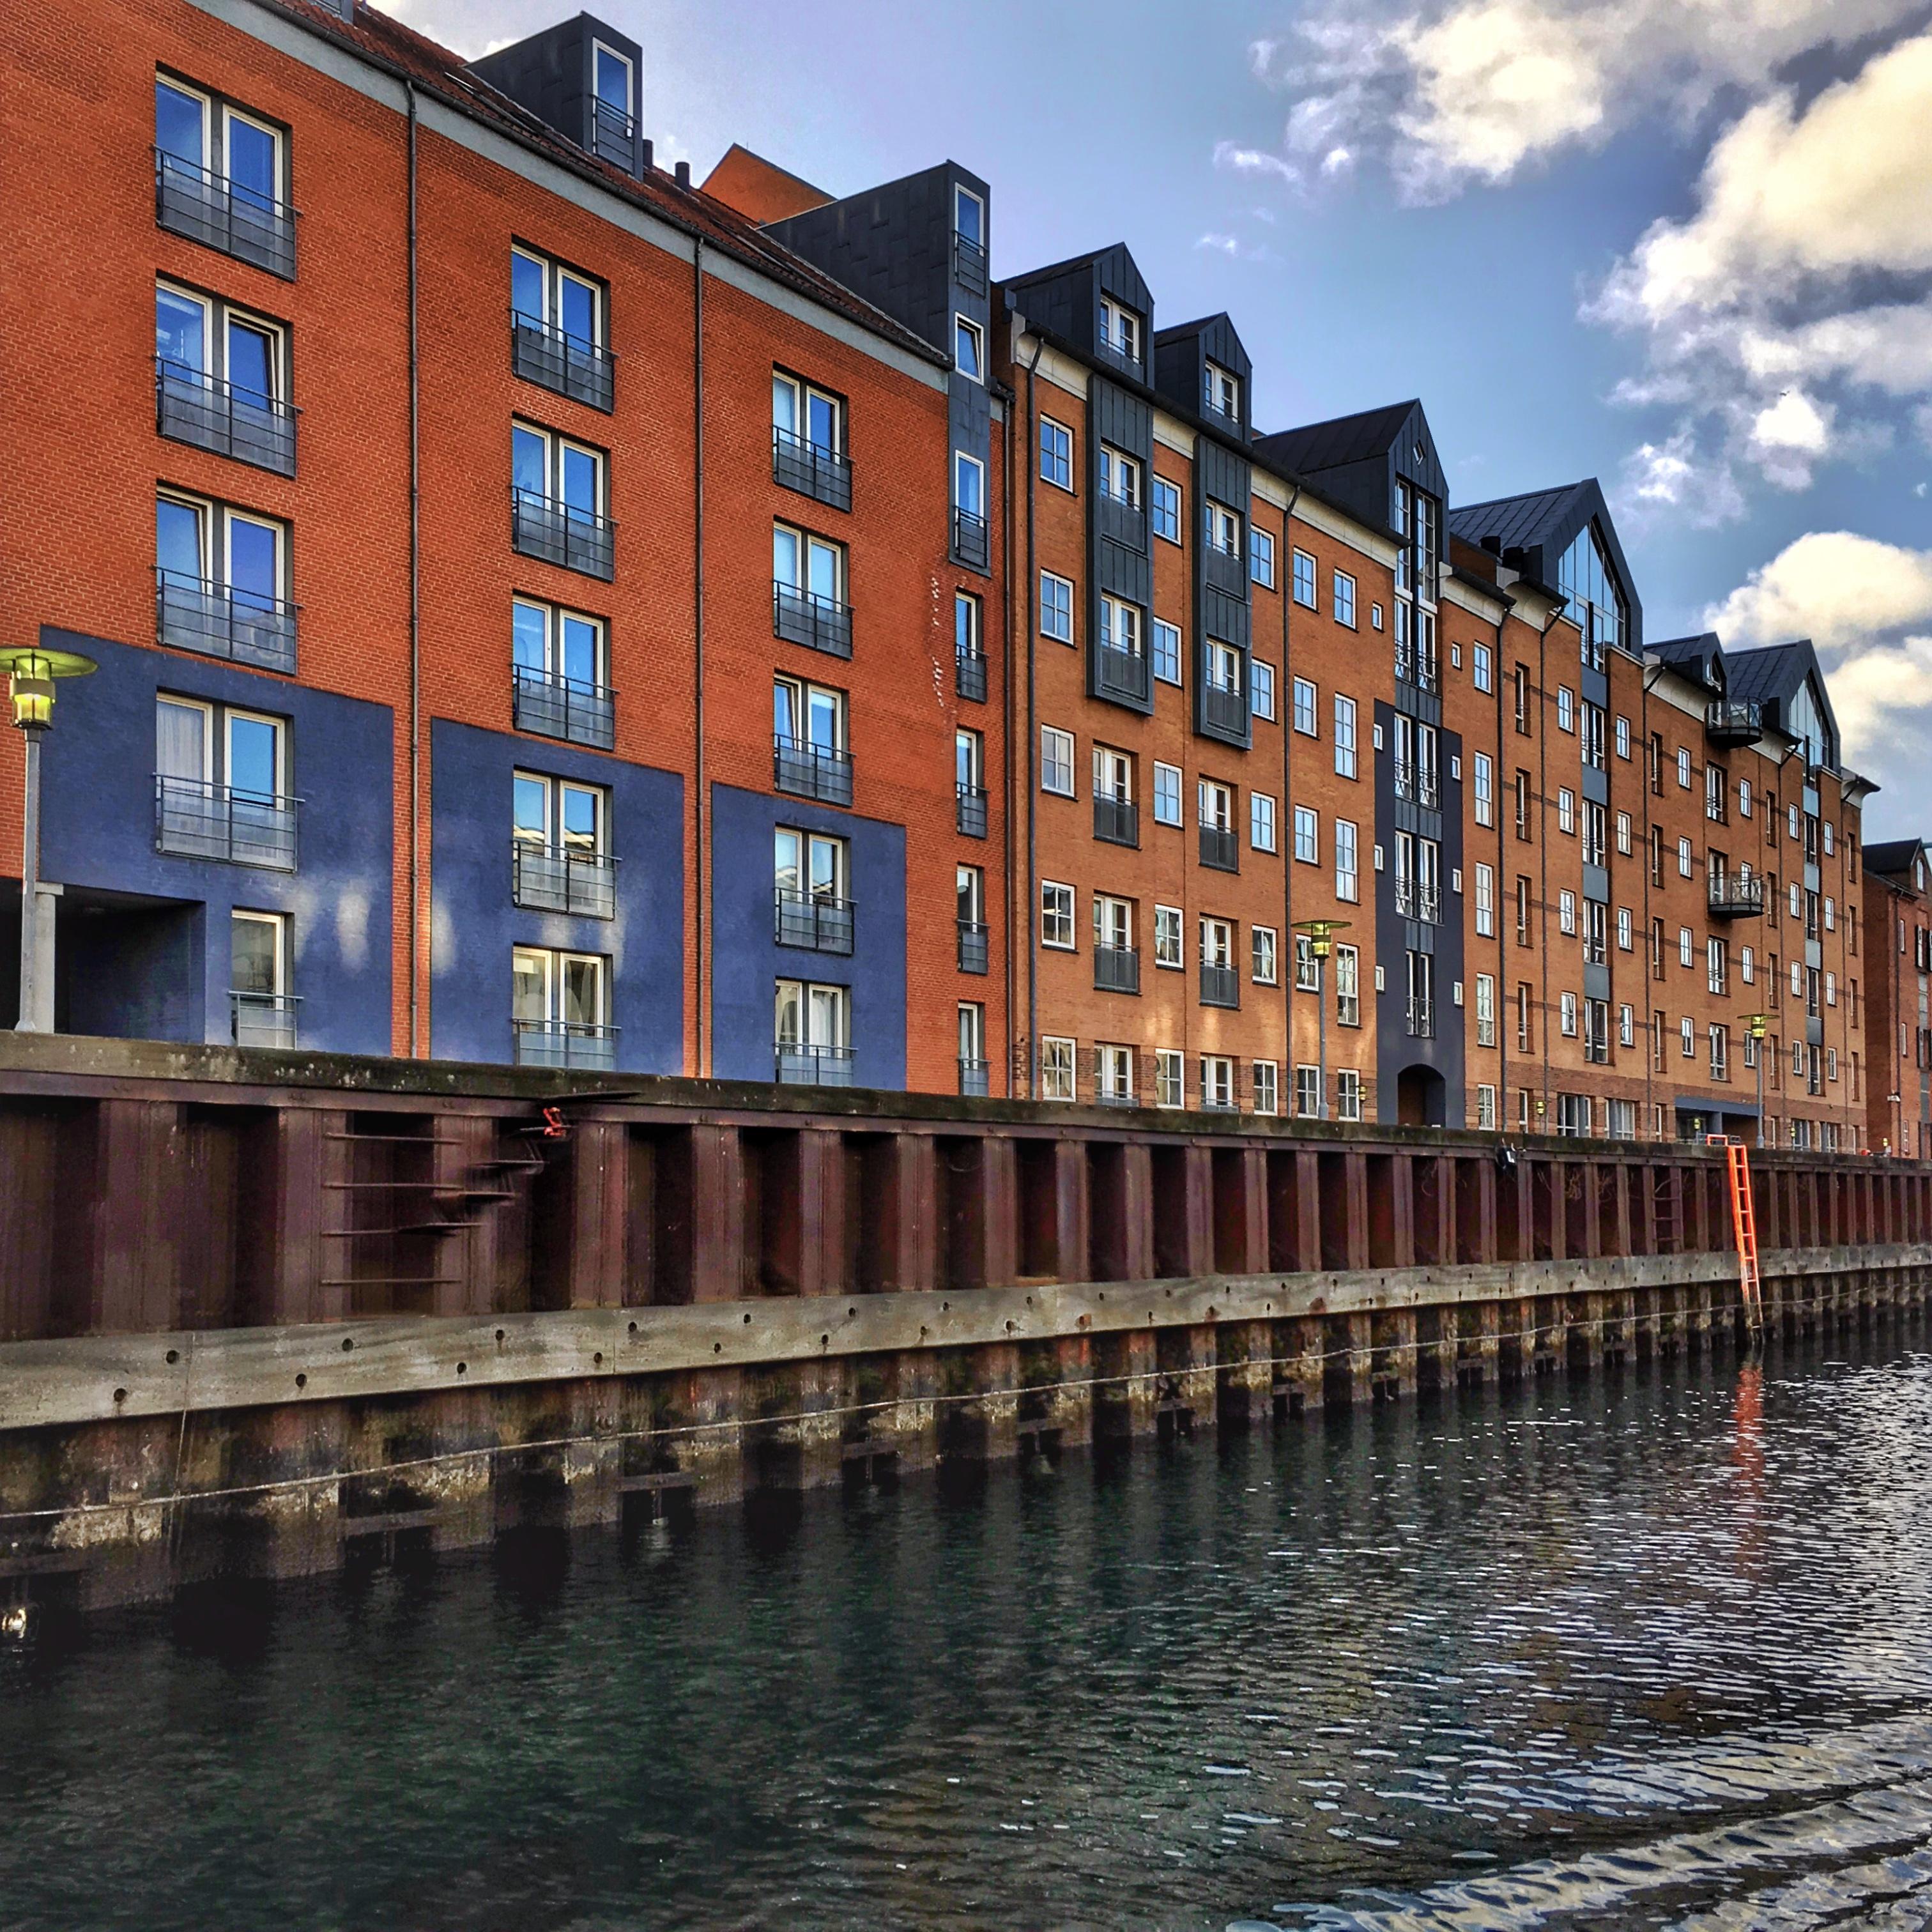 Waterfront Patterns